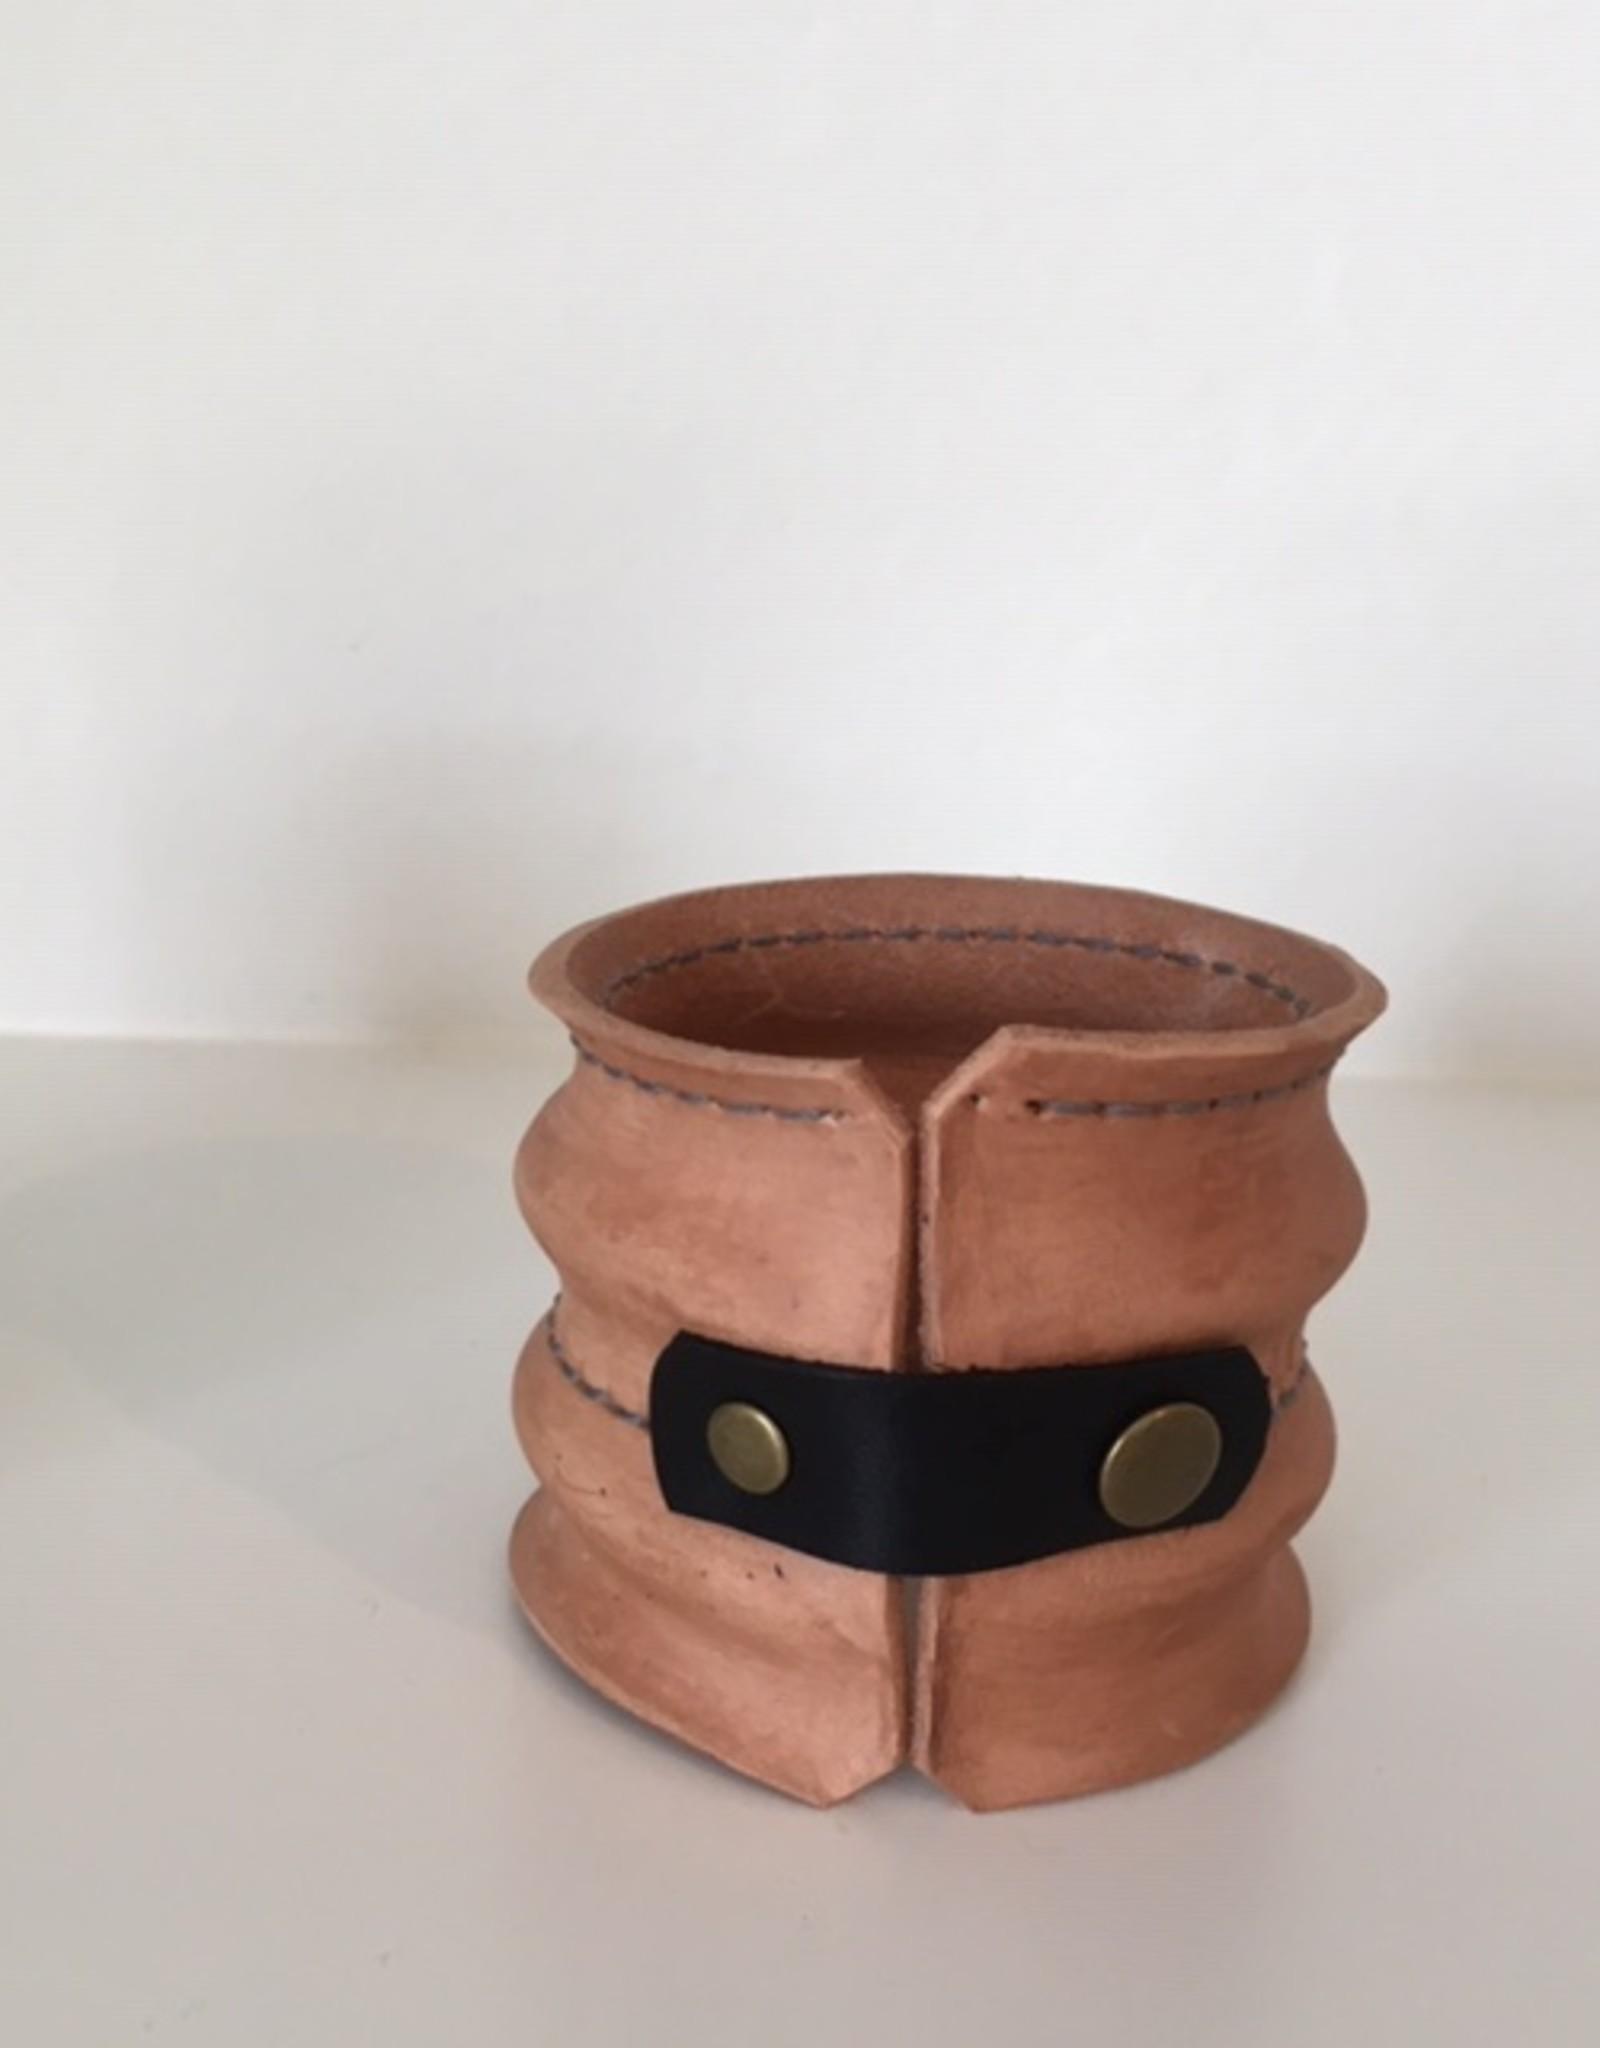 A Allen Design AA Design Leather Cuff